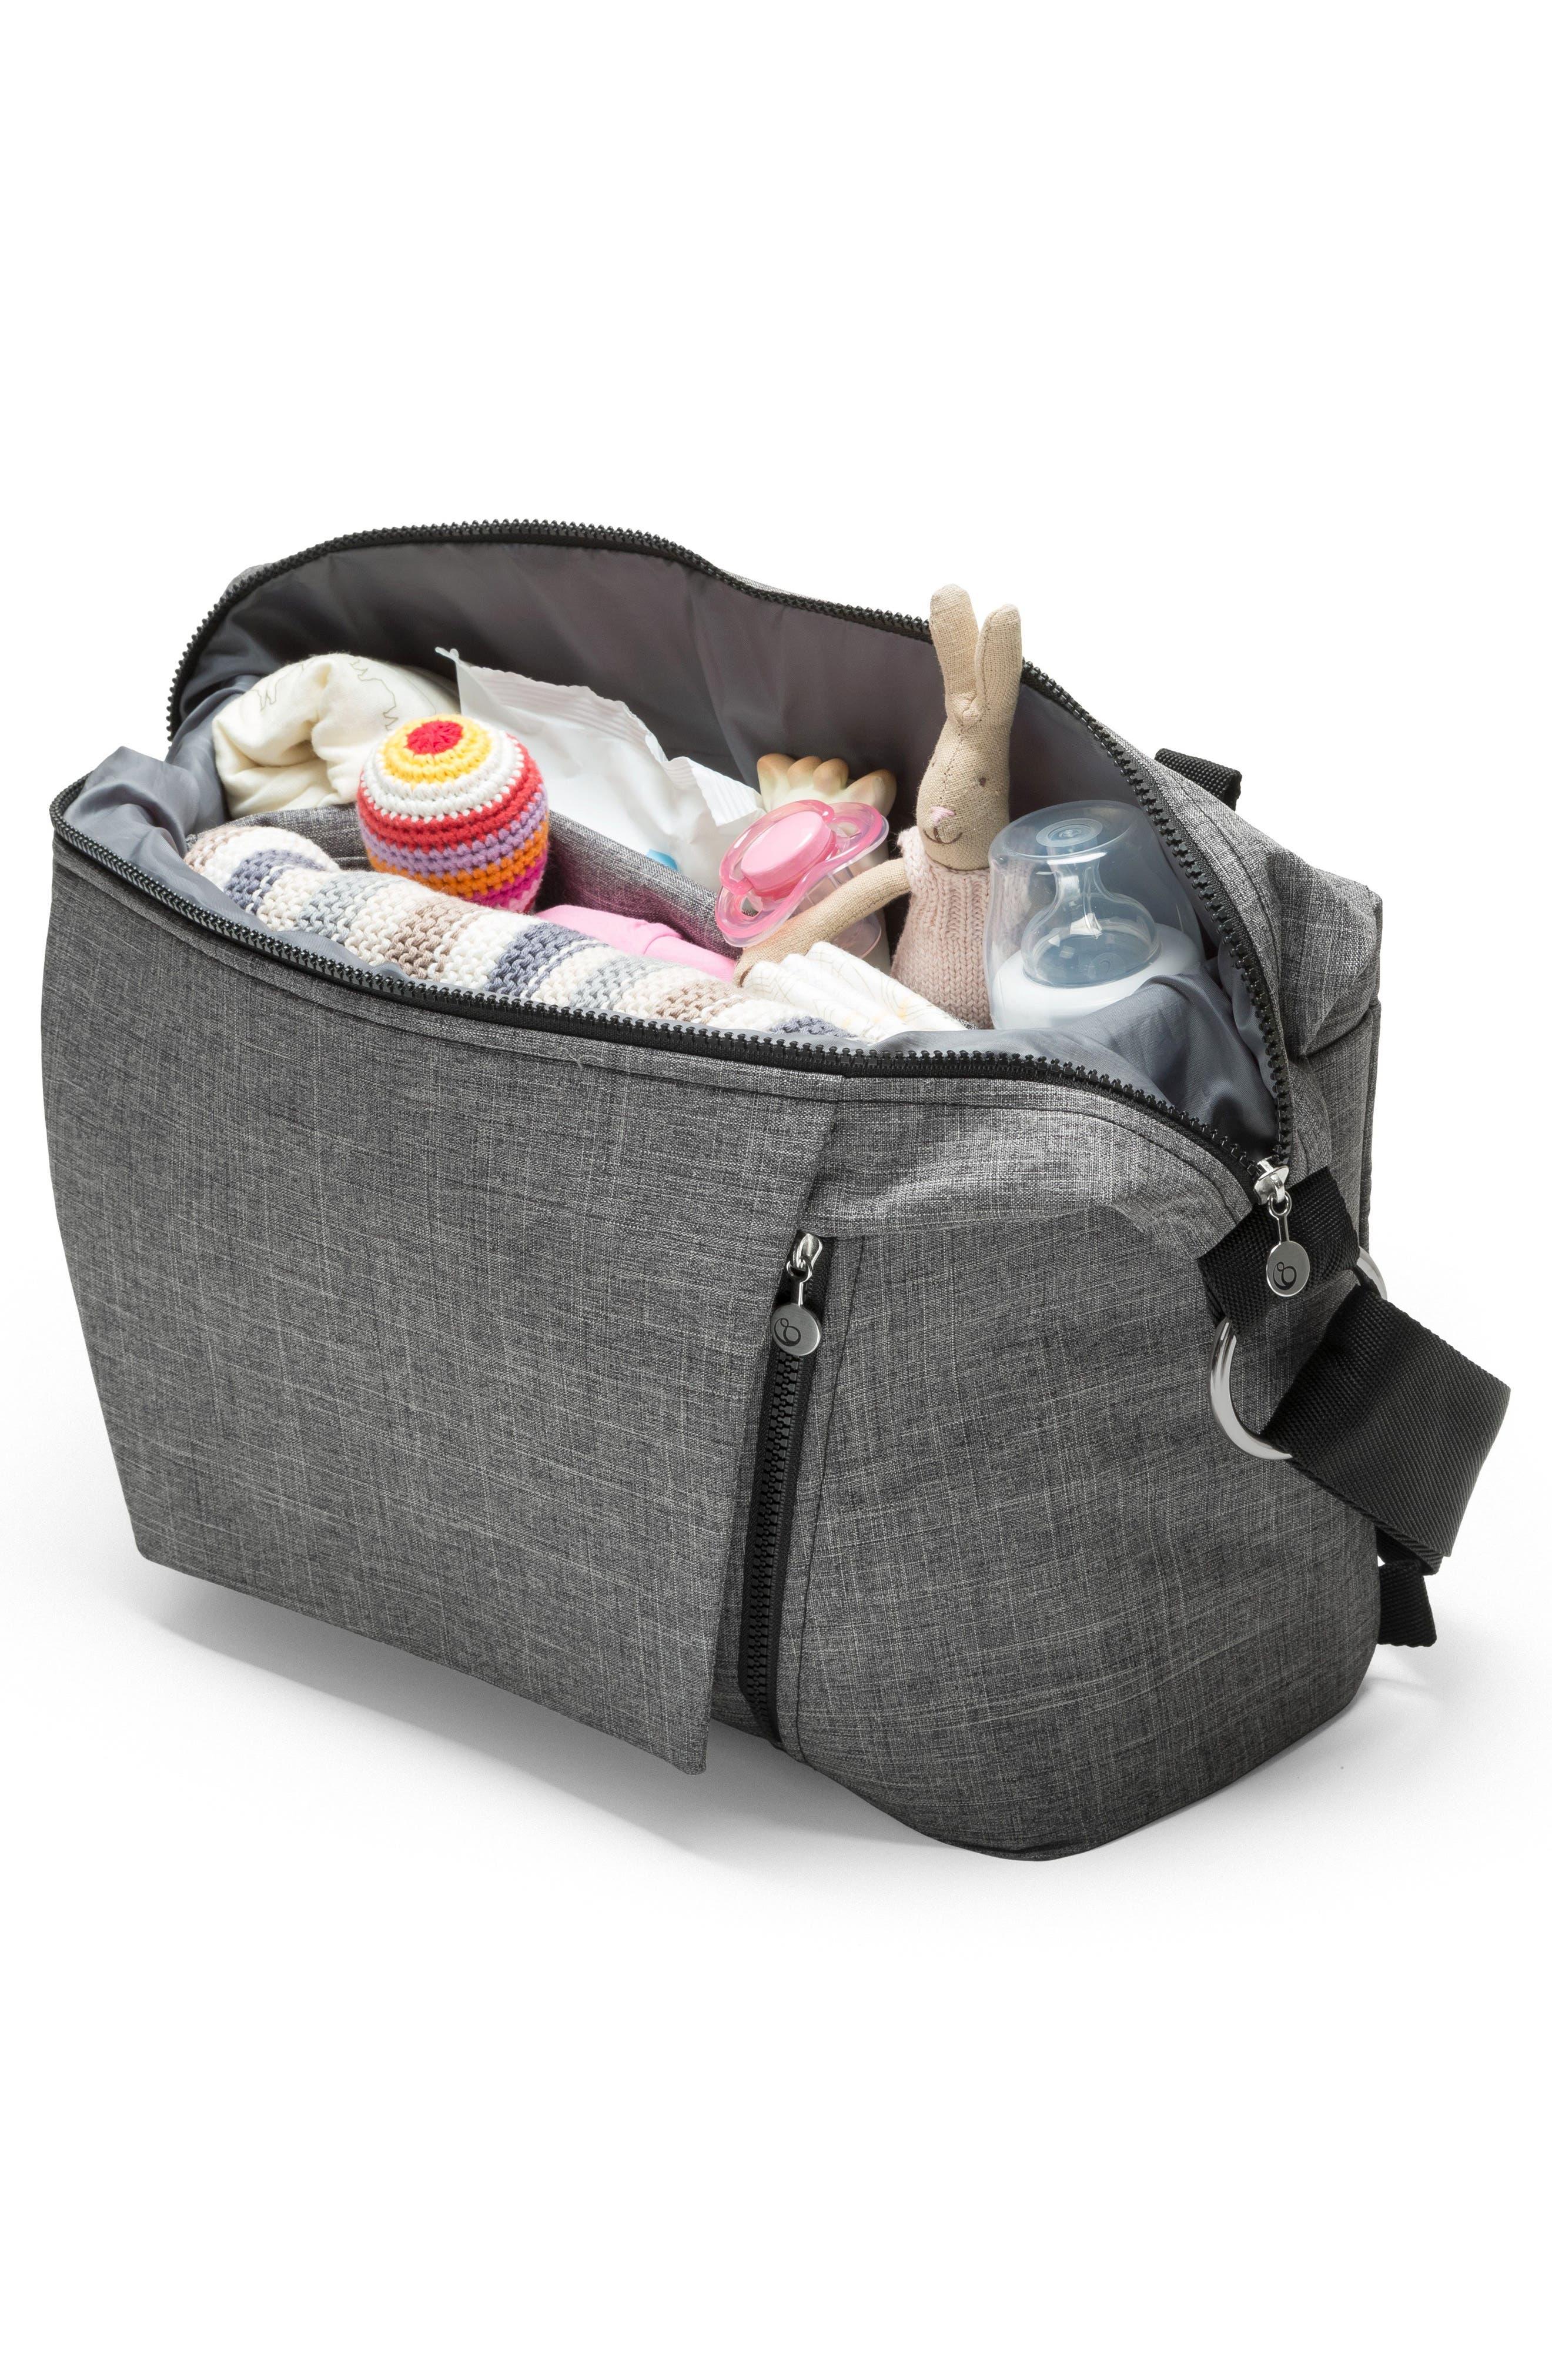 Baby 'Xplory<sup>®</sup>' Changing Bag,                             Alternate thumbnail 5, color,                             002